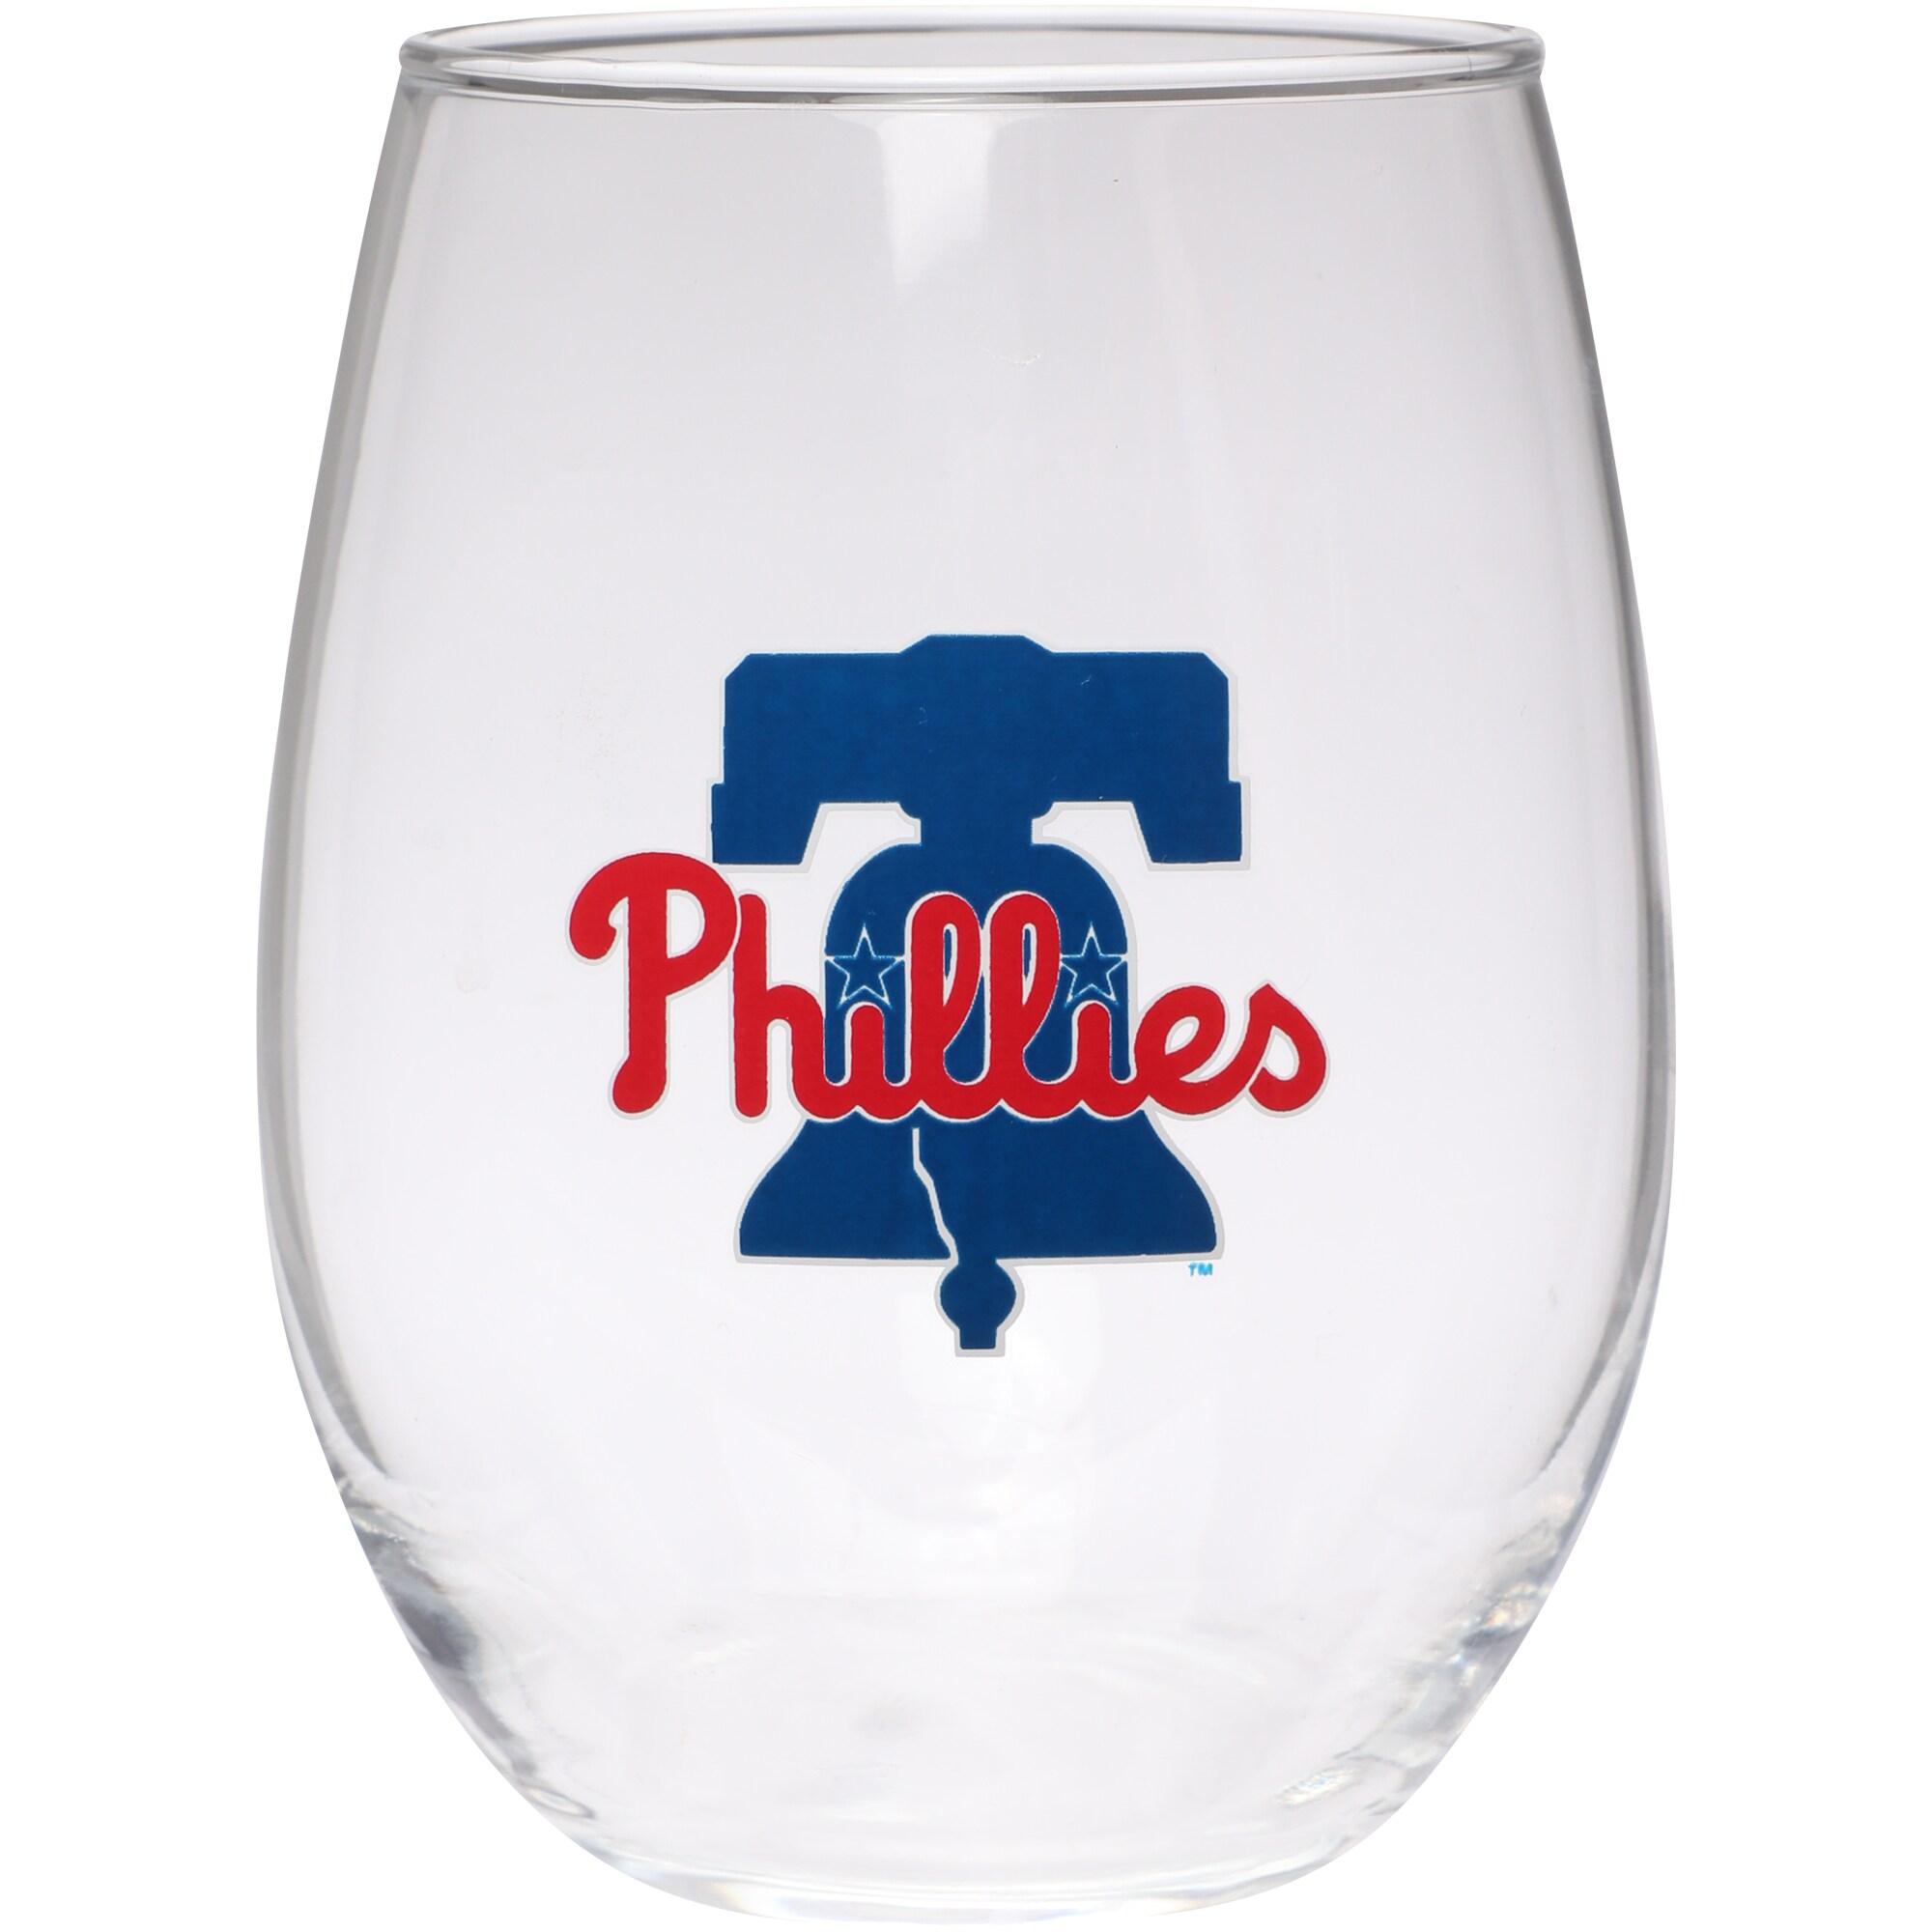 Philadelphia Phillies 15oz. Team Logo Stemless Wine Glass